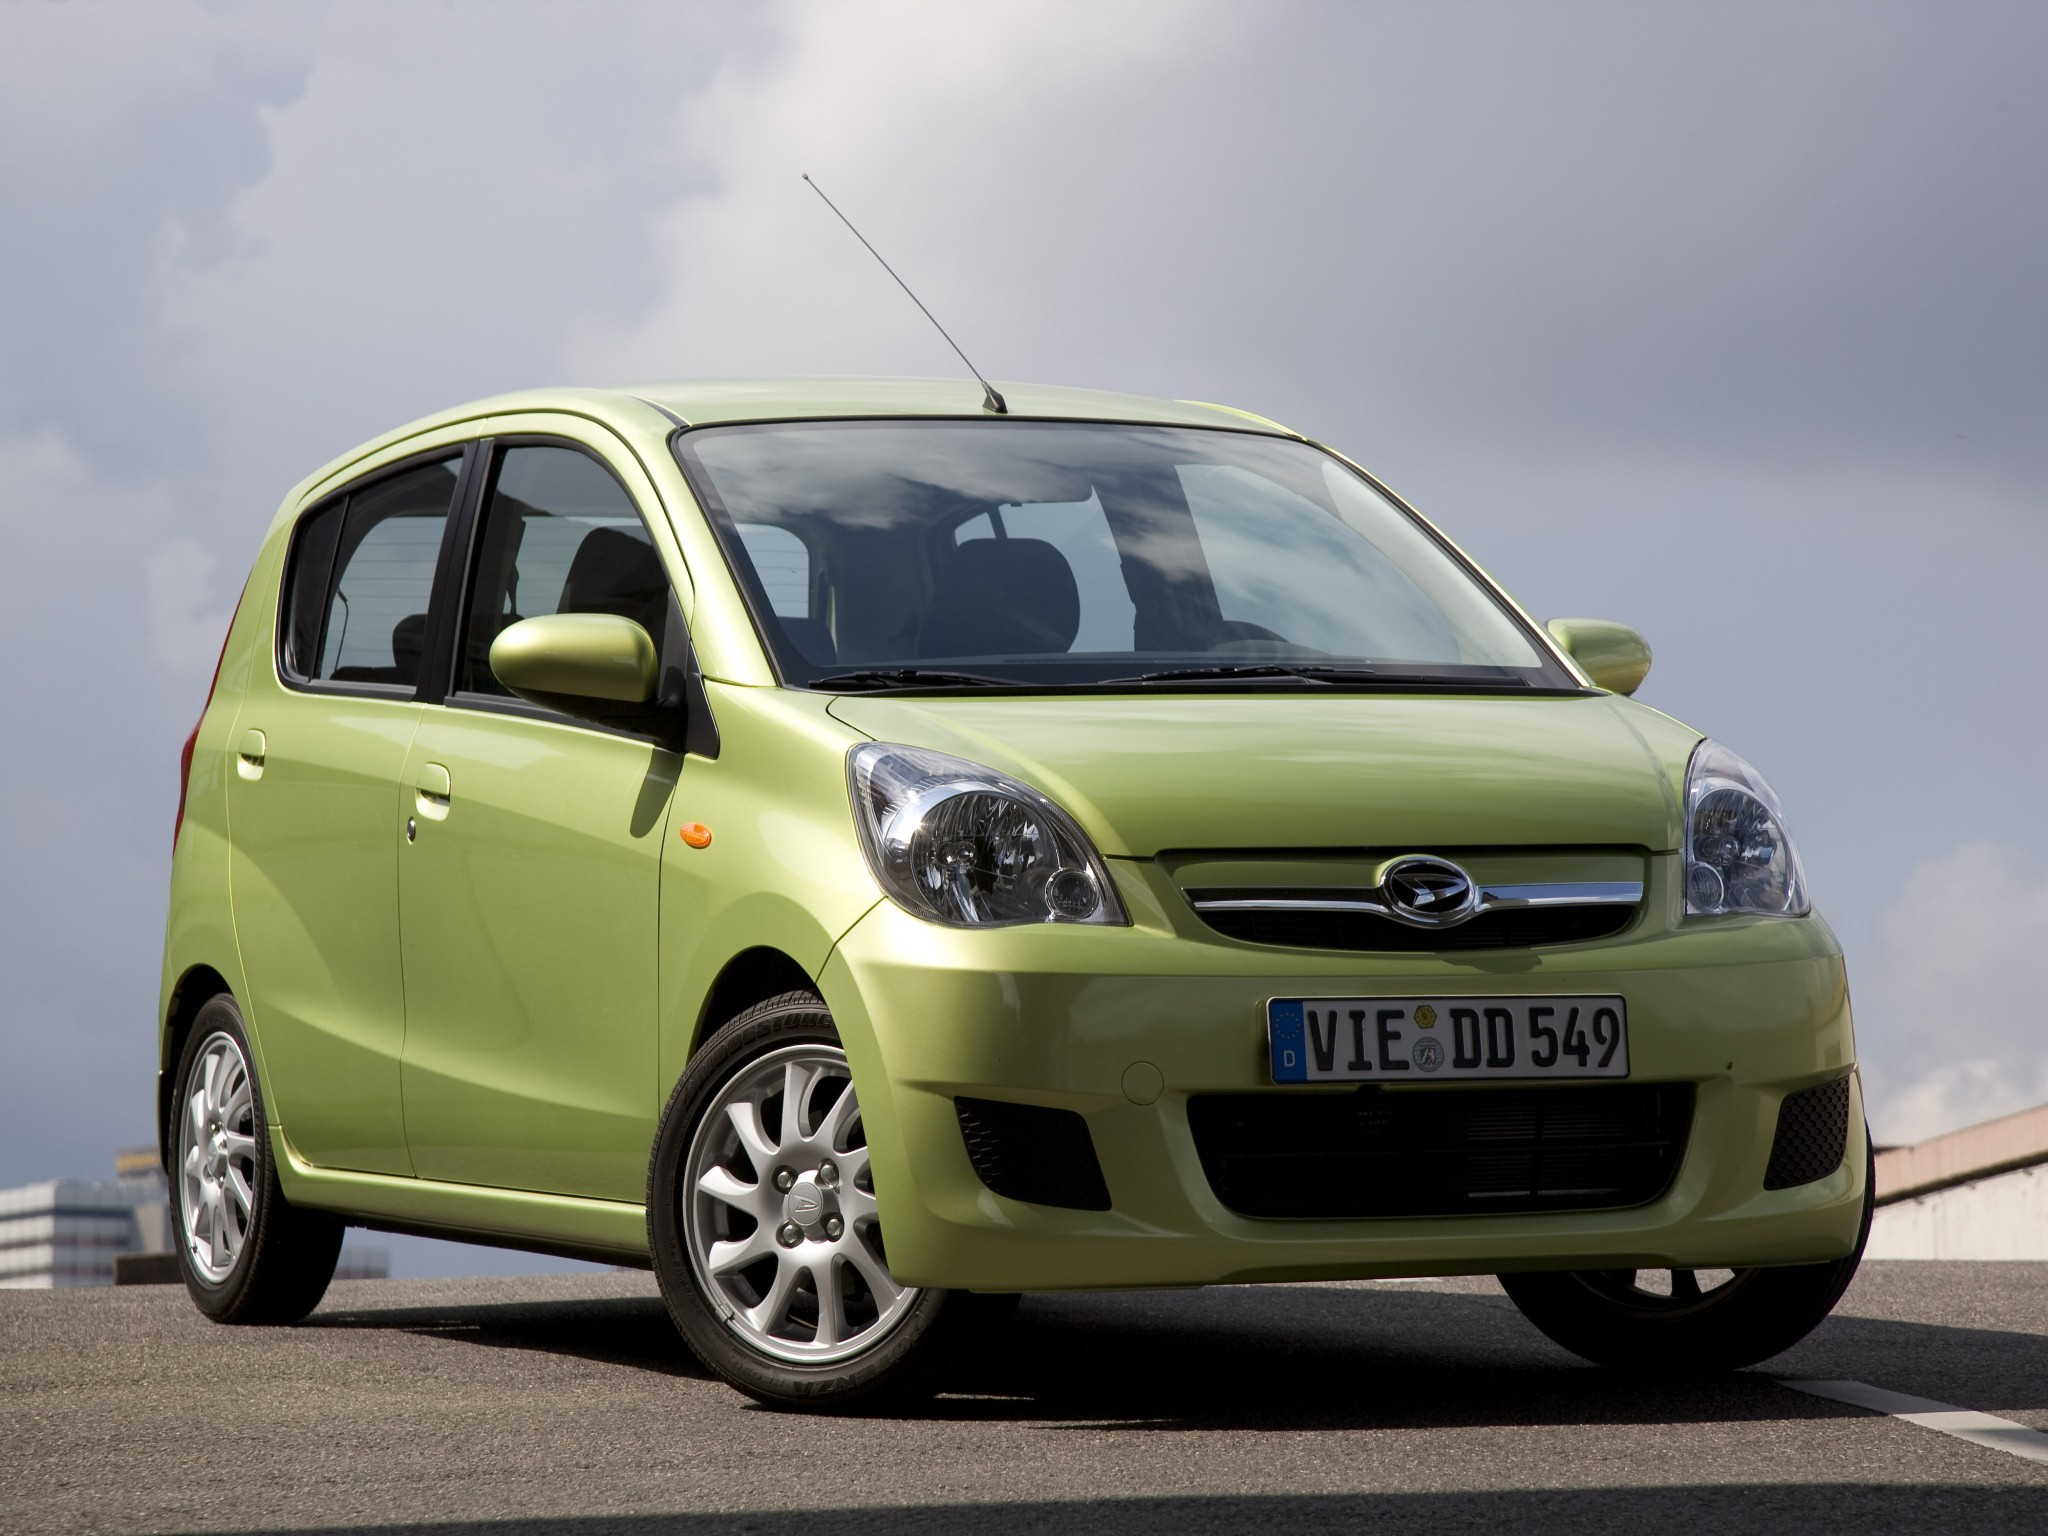 Gambar Isc Avanza Xenia Rush Dan Terios also Daihatsu Sirion also Daihatsucuore L Bdc C C additionally Pictures Of Opel Meriva B further Maxresdefault. on daihatsu terios 2016